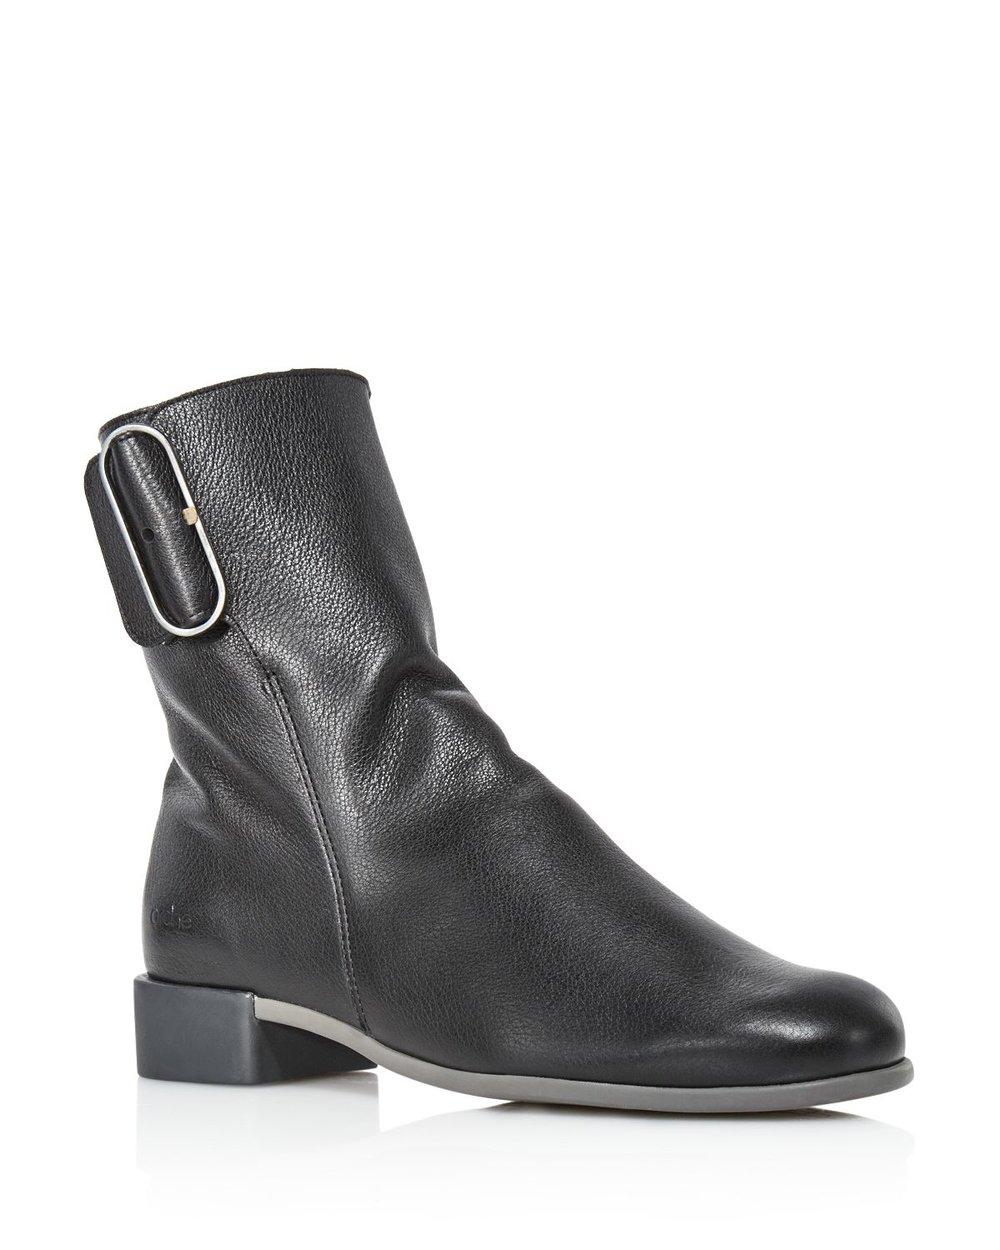 Arche Twibel Boots, $520